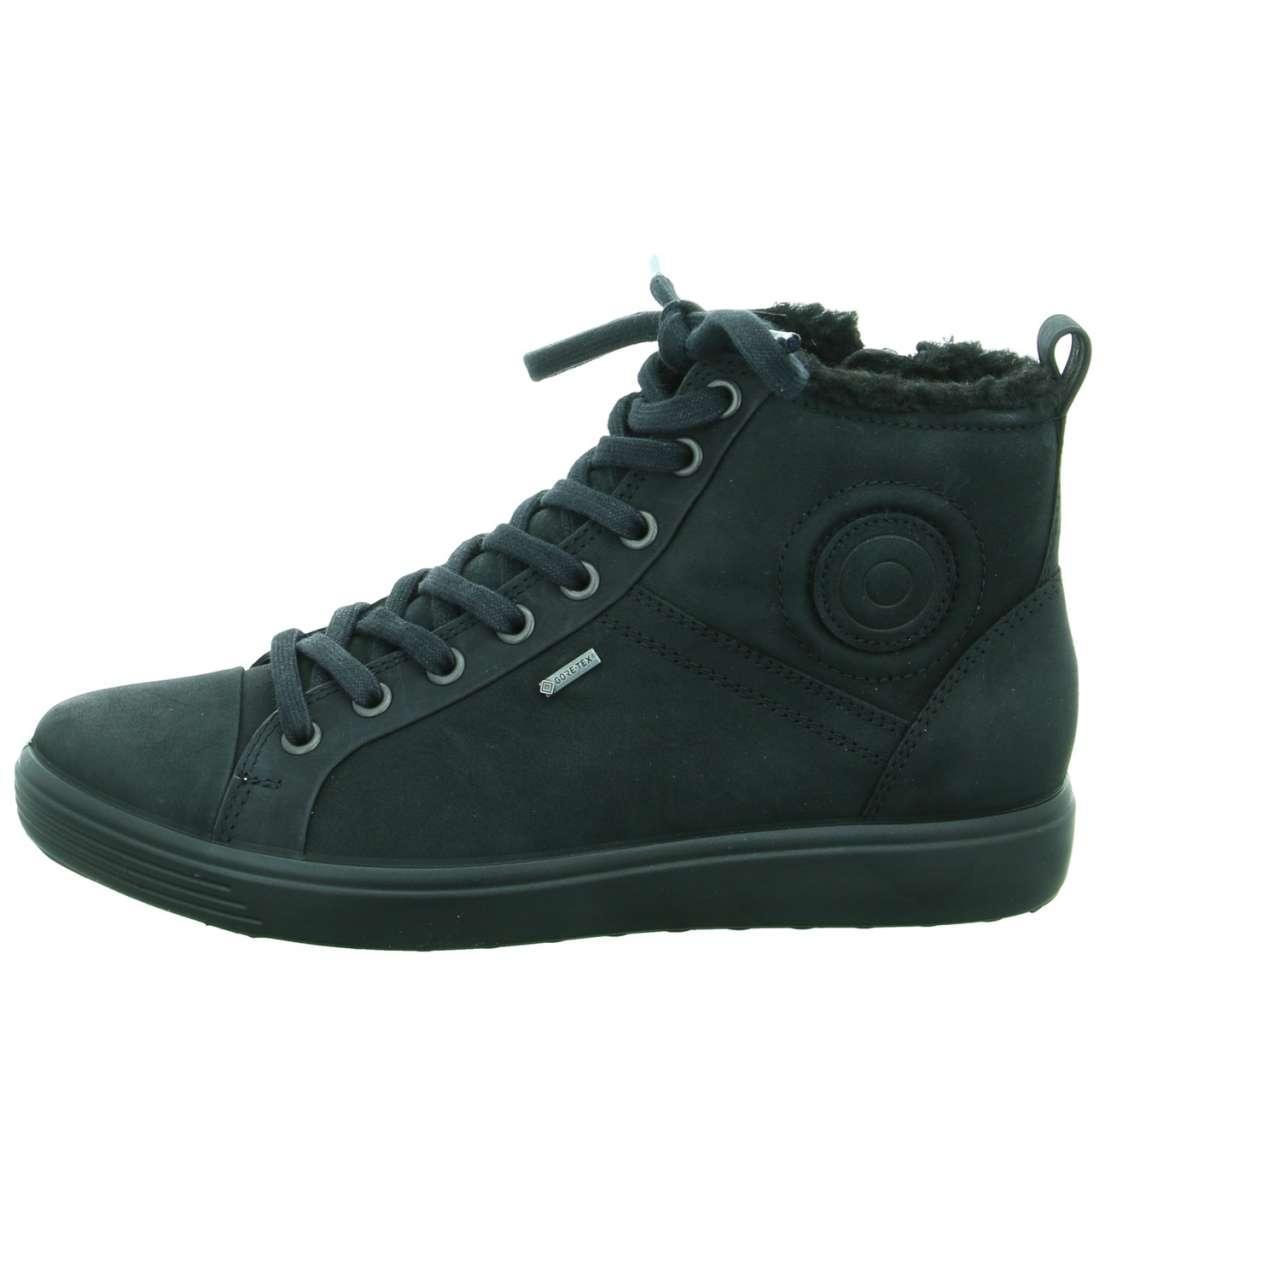 Ecco Wo Winter Boots Black Soft 7 Ladies Lyst